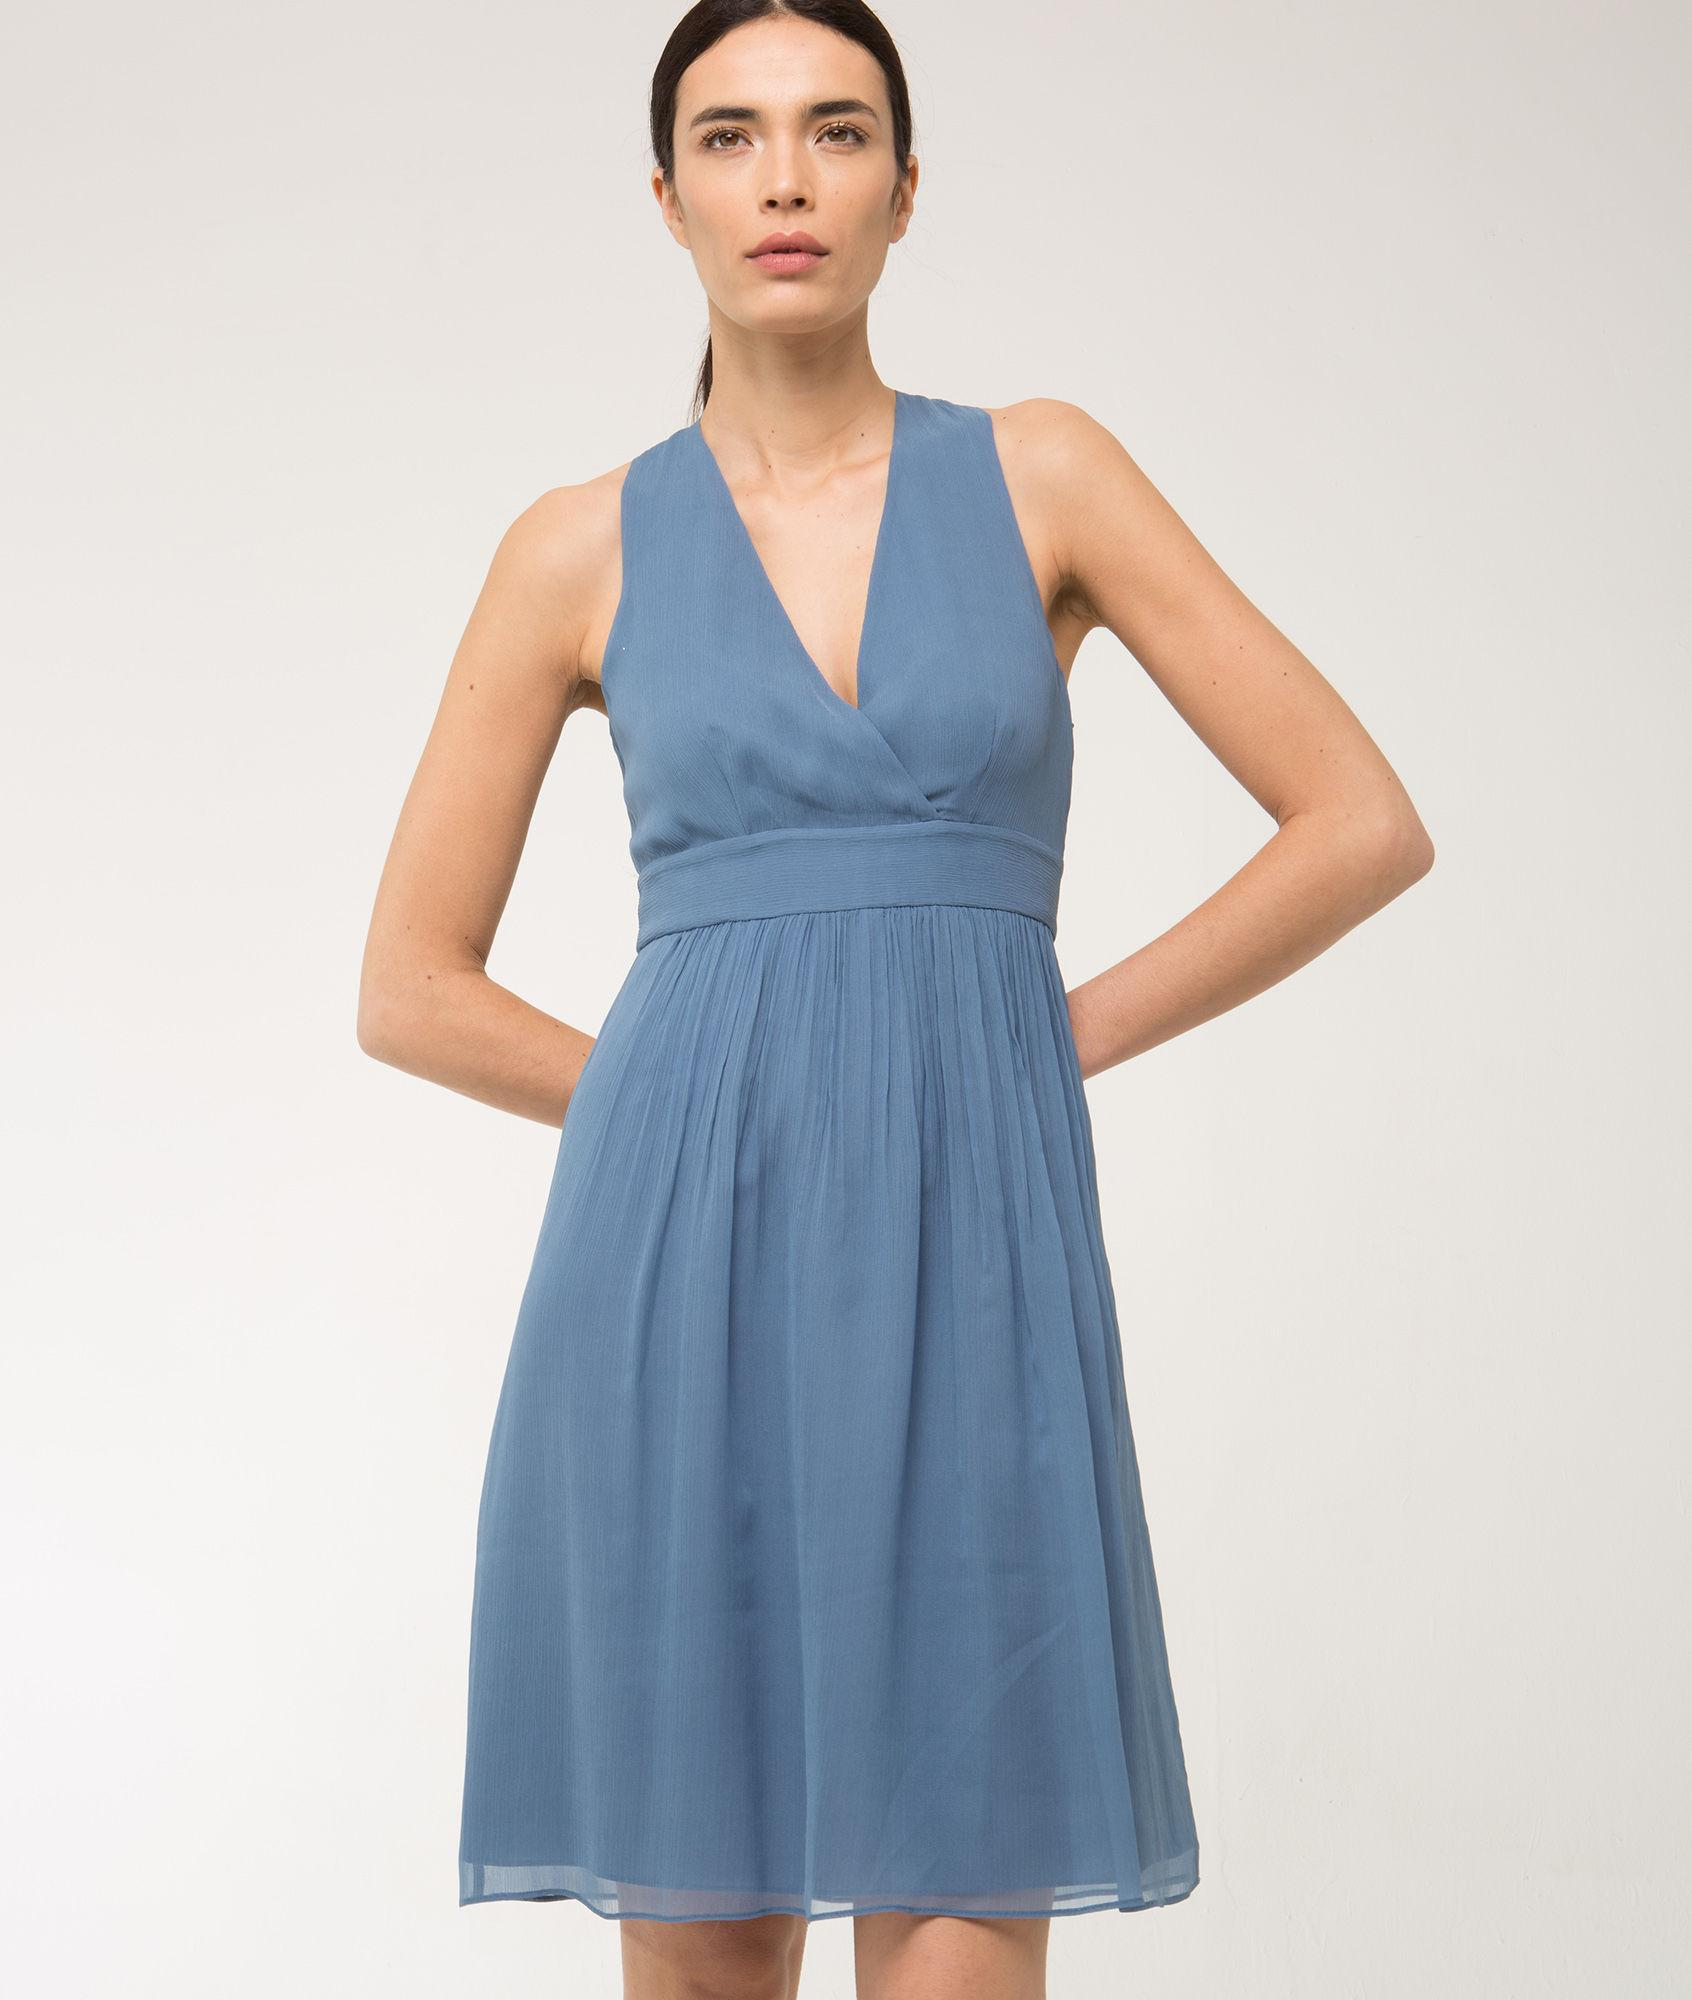 Robe 123 bleu